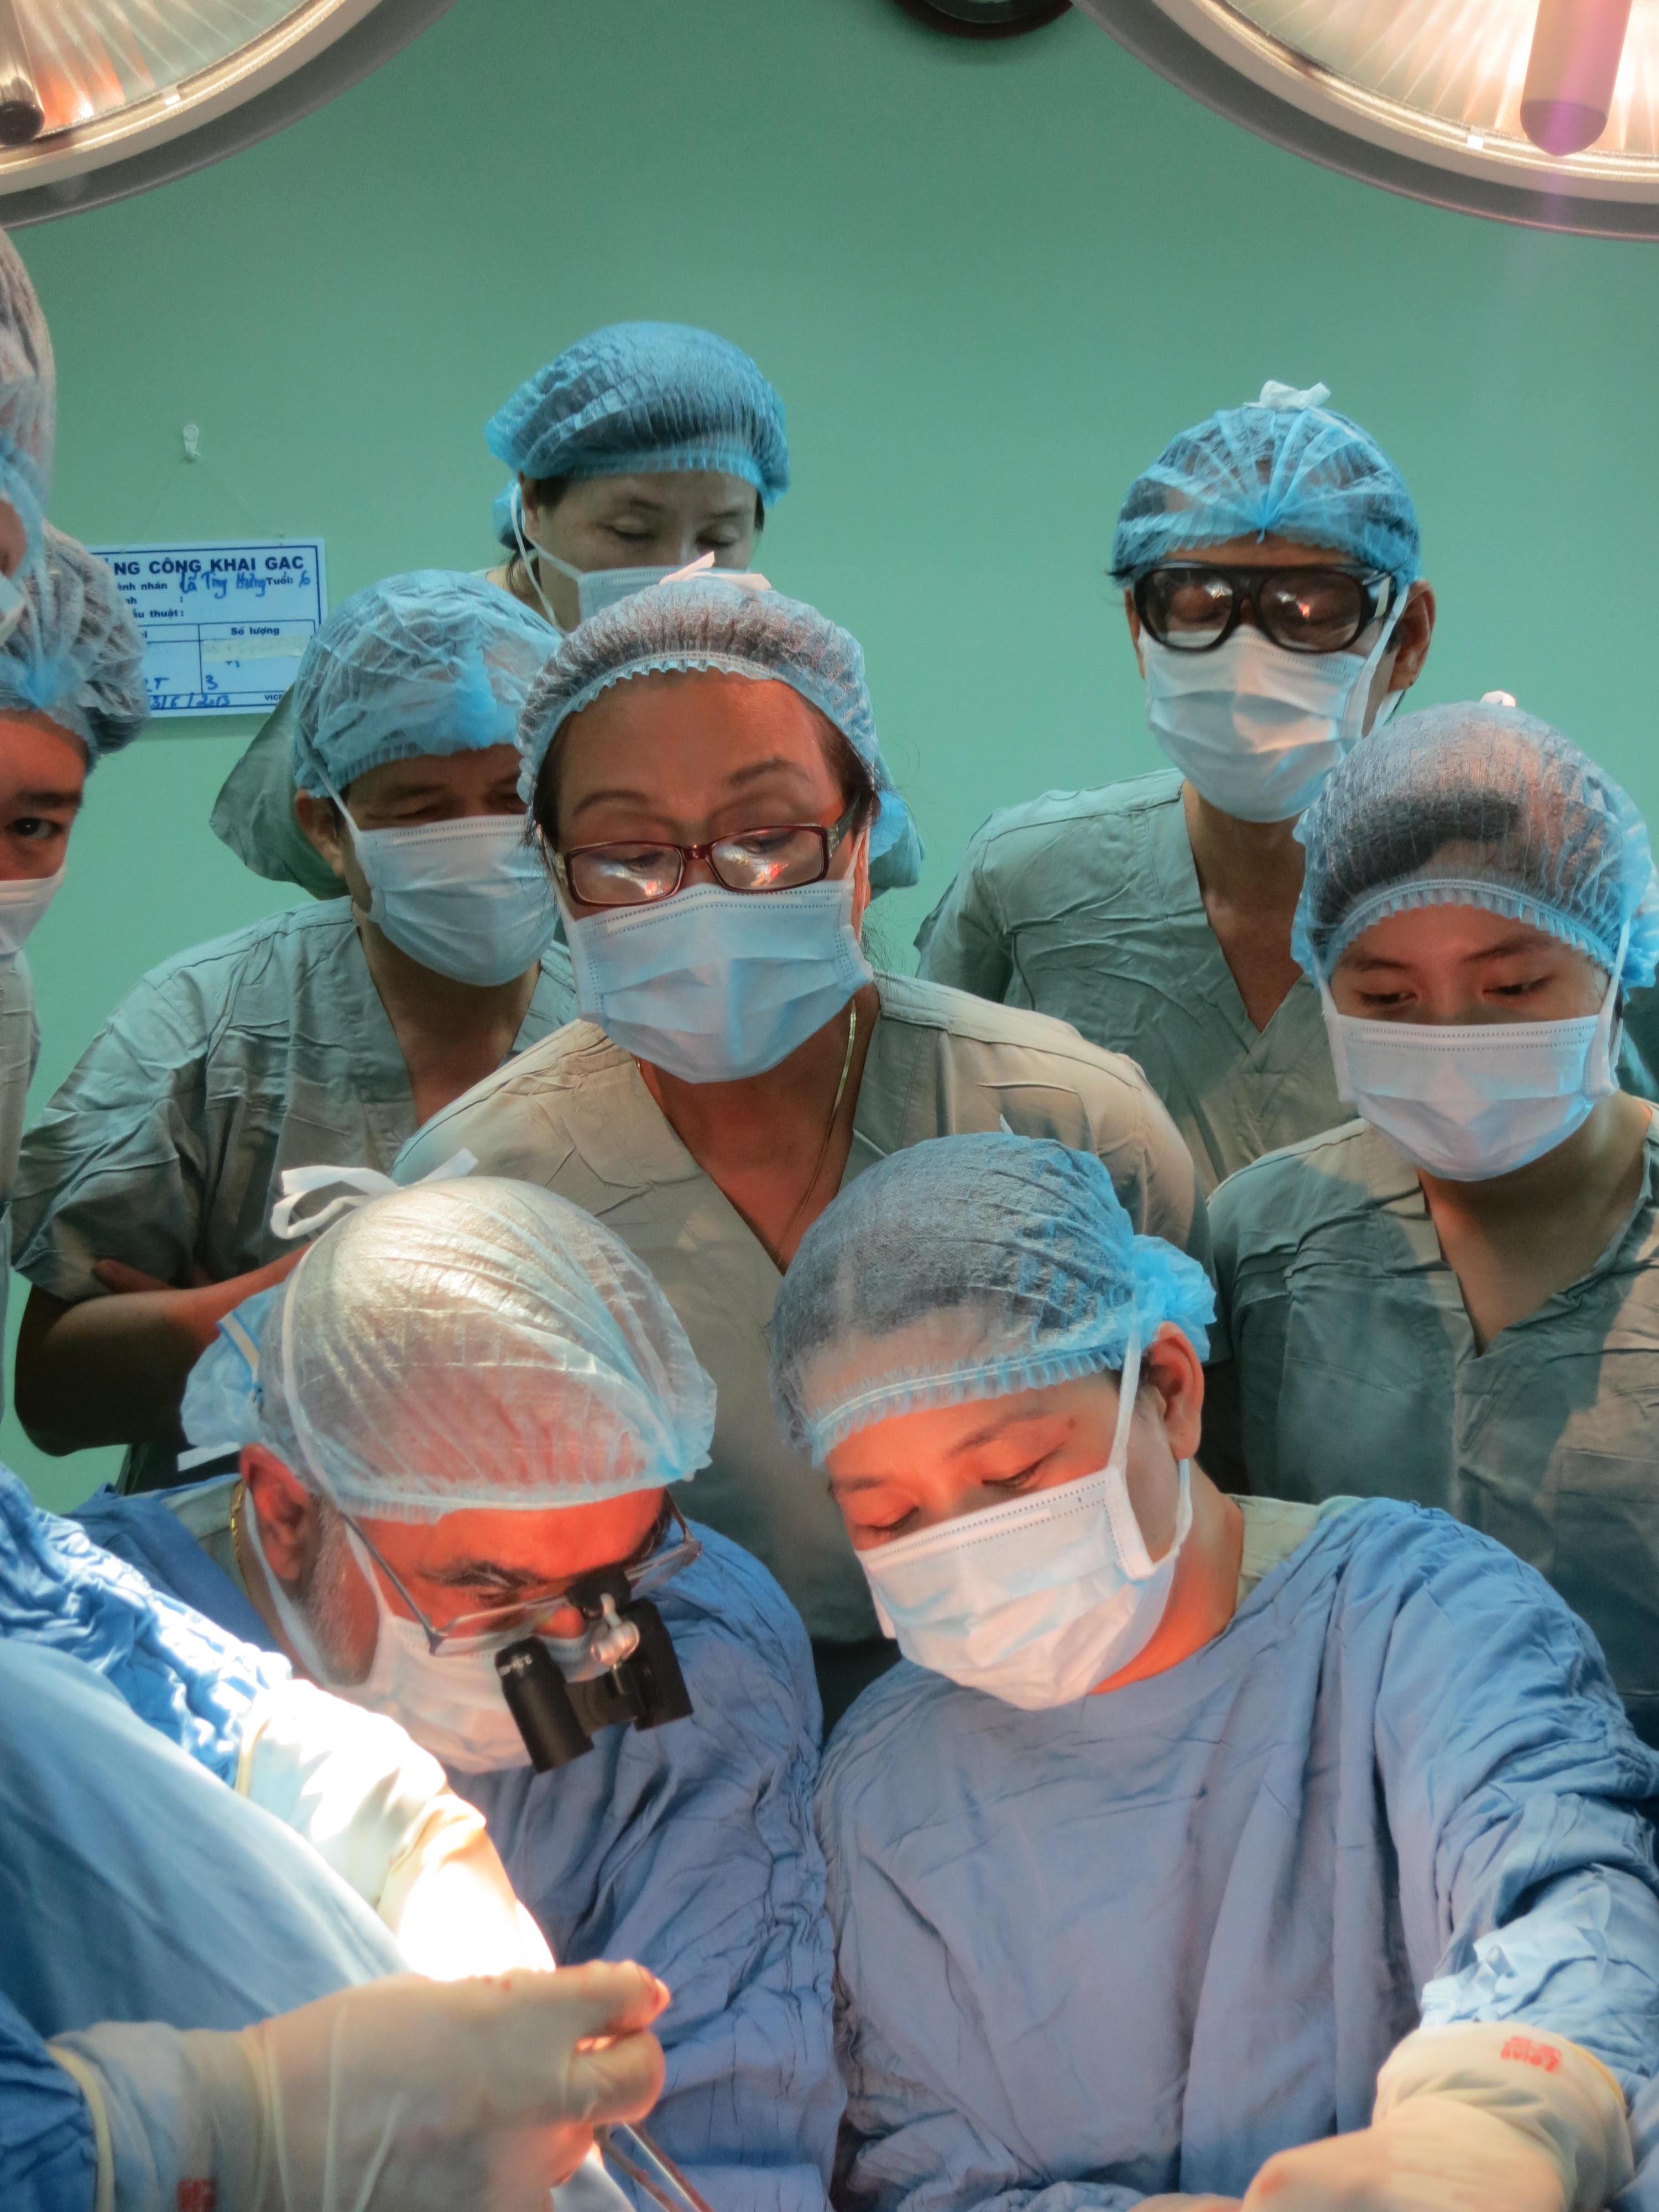 2013 Surgery in progress